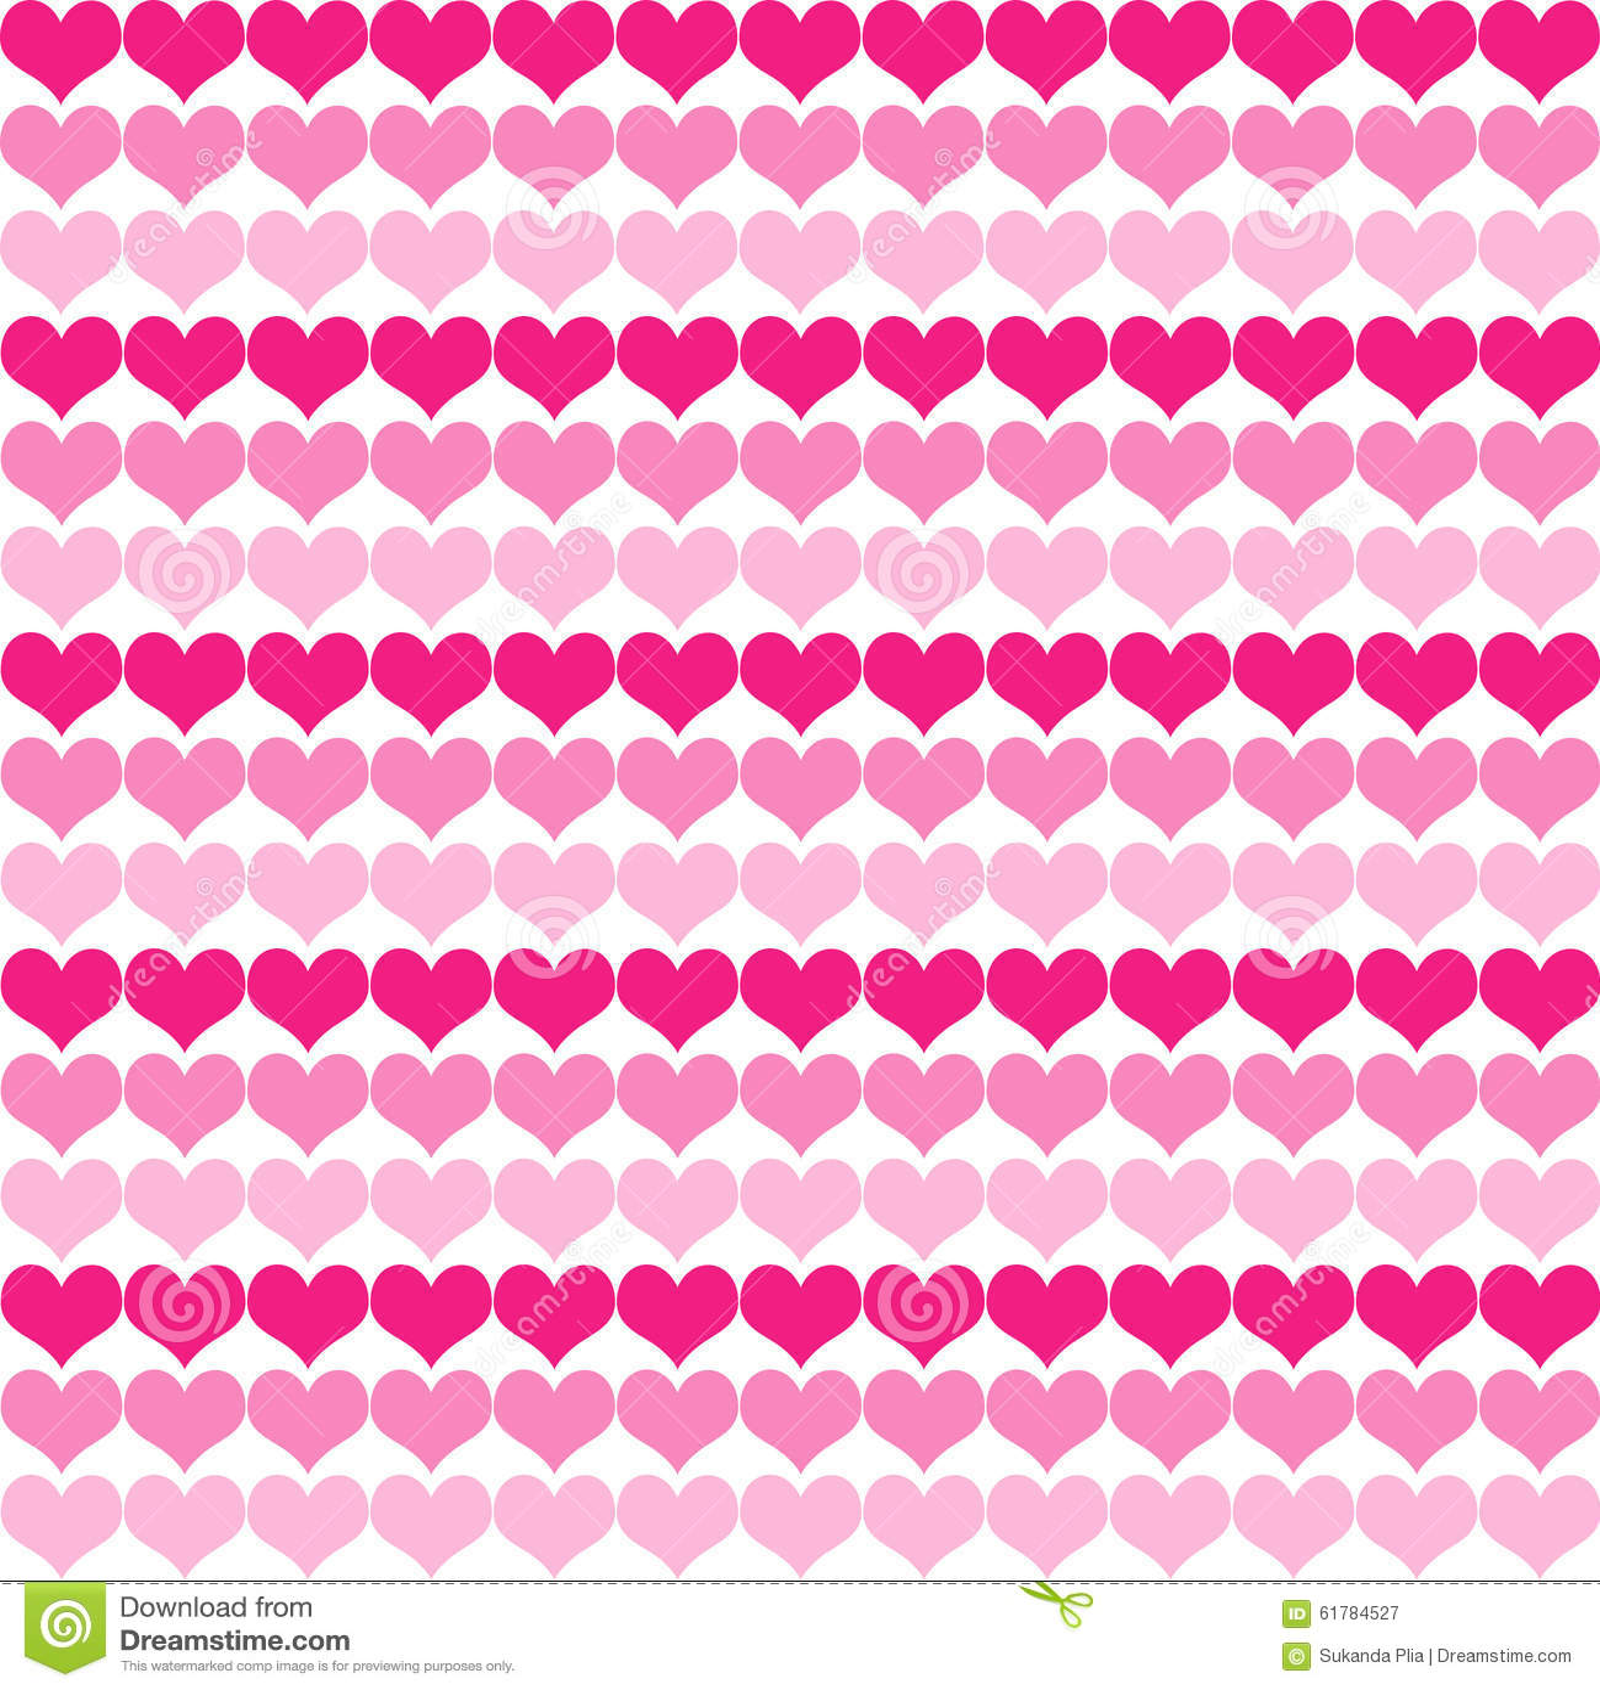 Pink Tone Little Heart Pattern Background